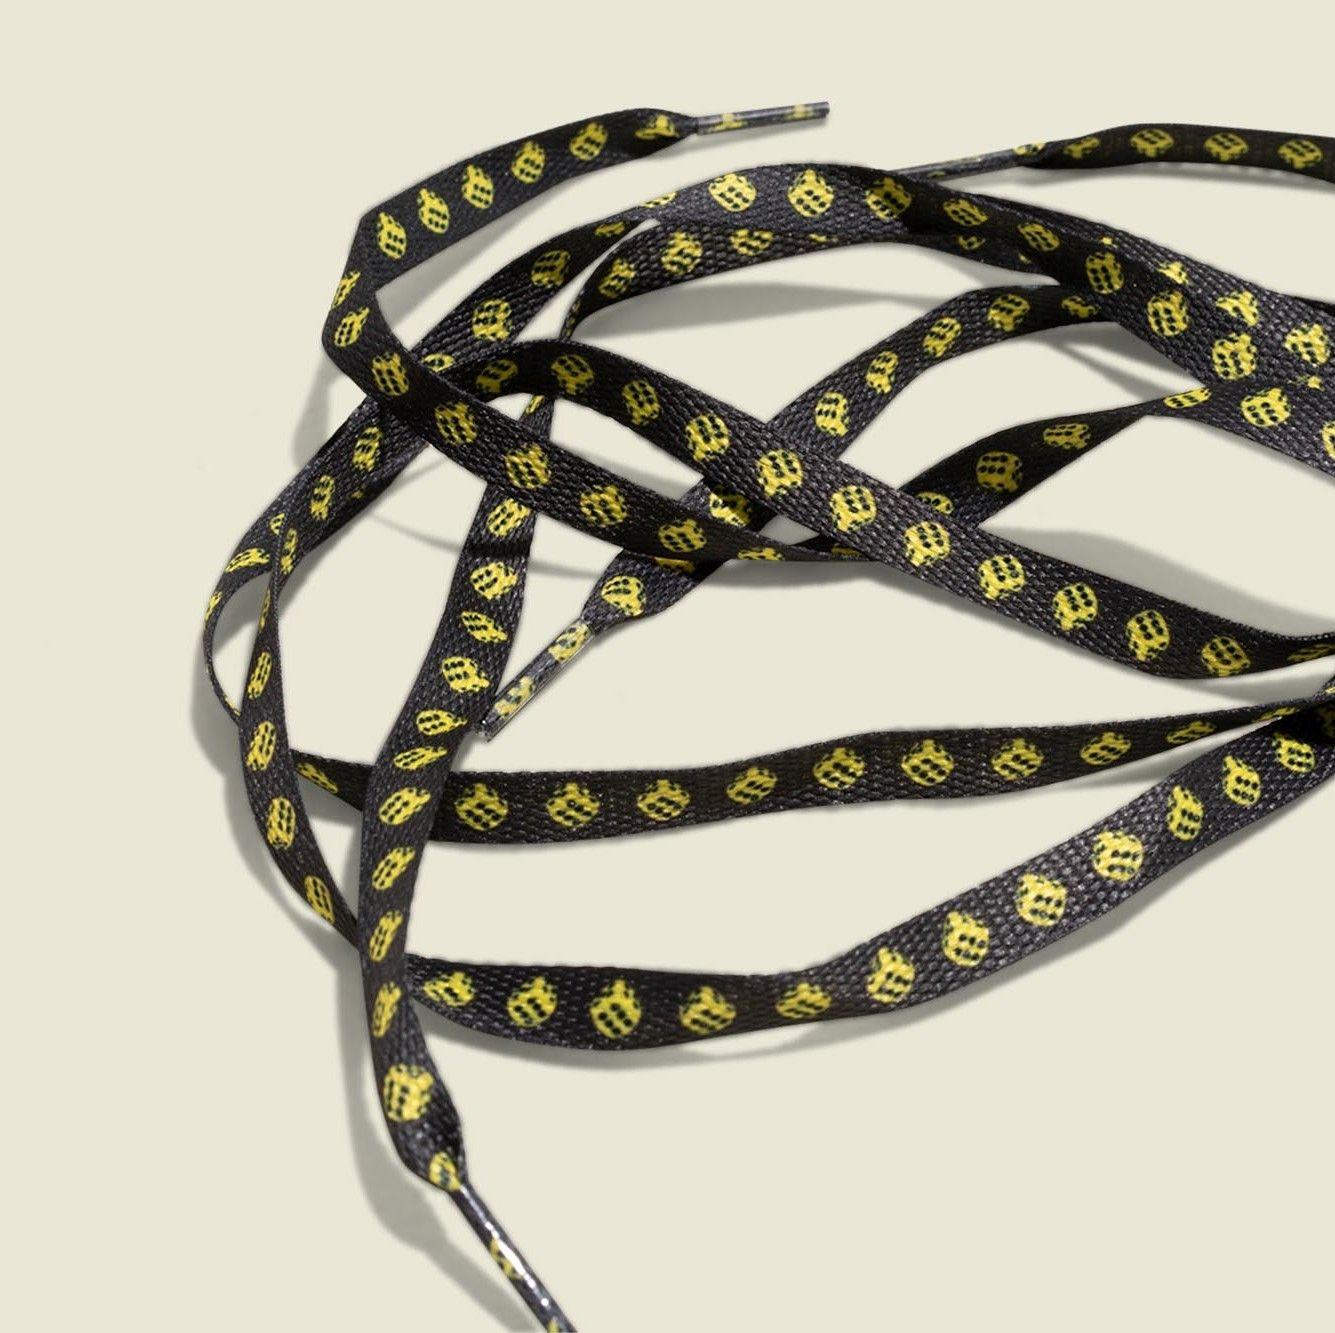 Custom shoe laces